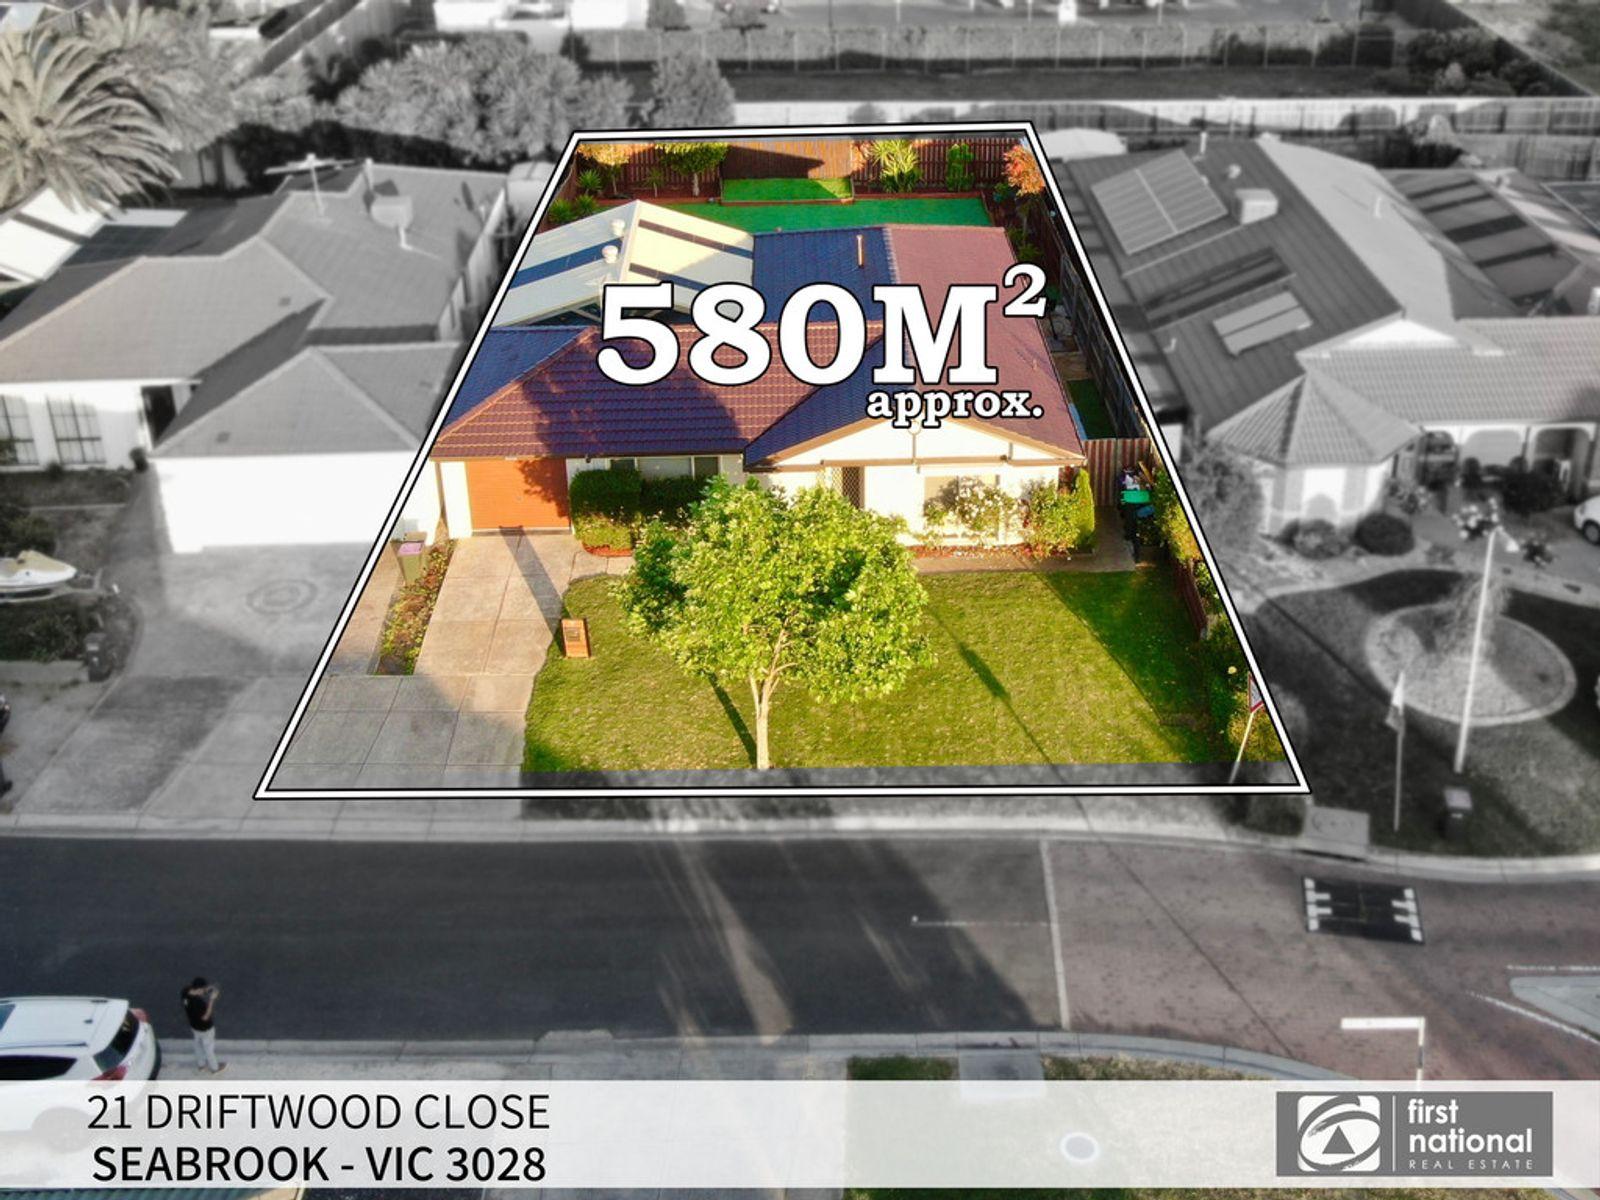 21 Driftwood Close, Seabrook, VIC 3028